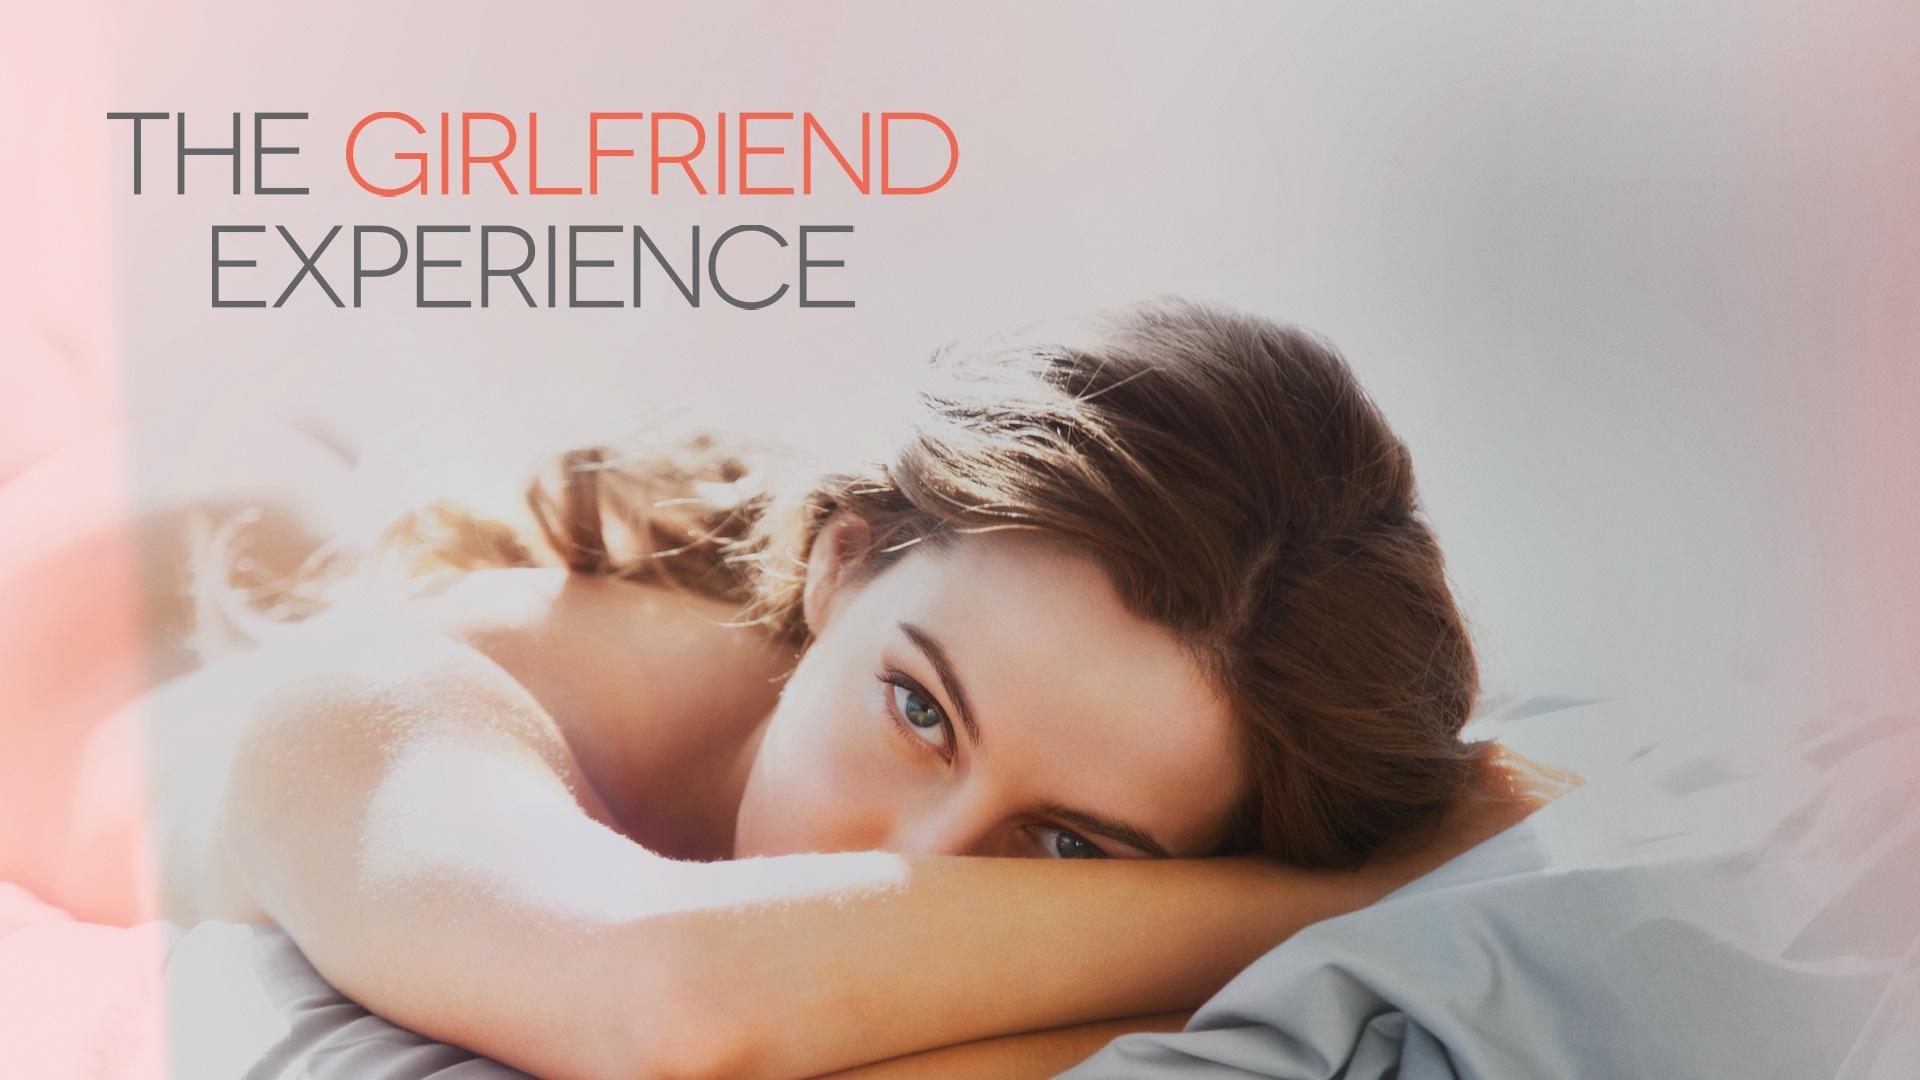 The Girlfriend Experience BluTV'de!